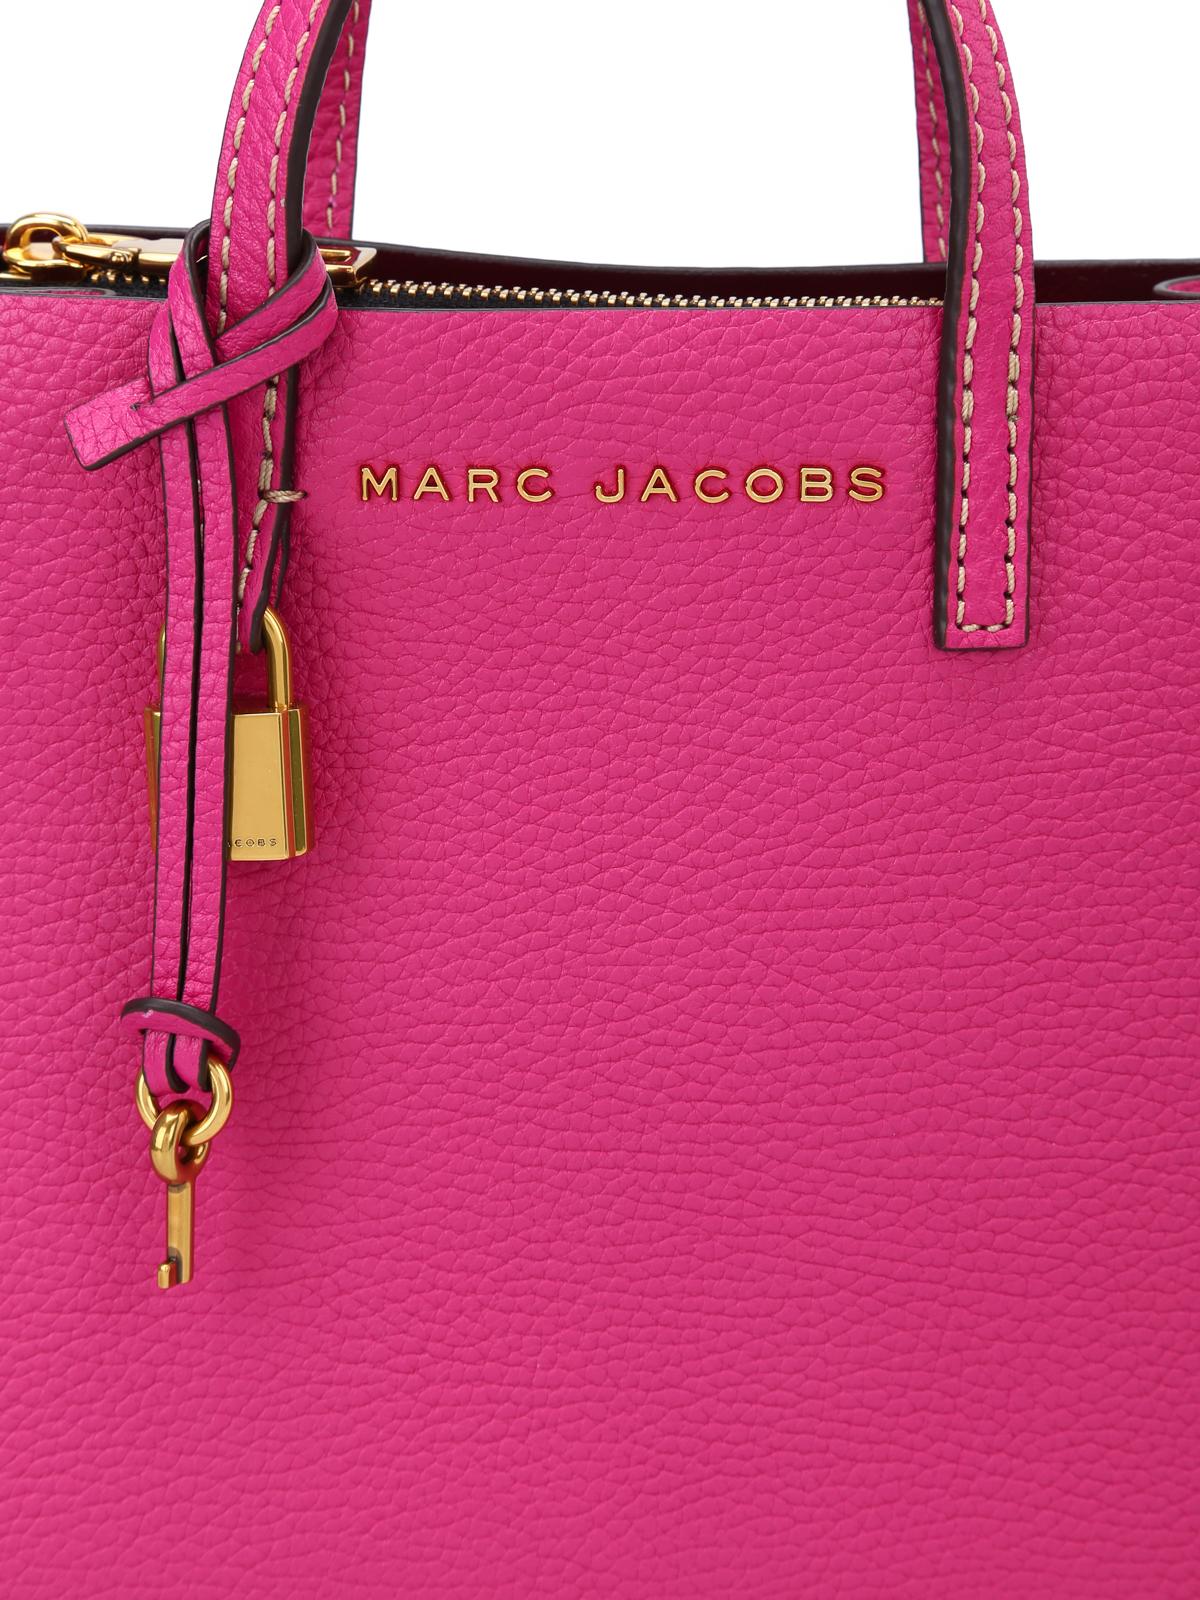 63a7dfc3defc Marc Jacobs - Mini Grind hydrangea leather bag - cross body bags ...